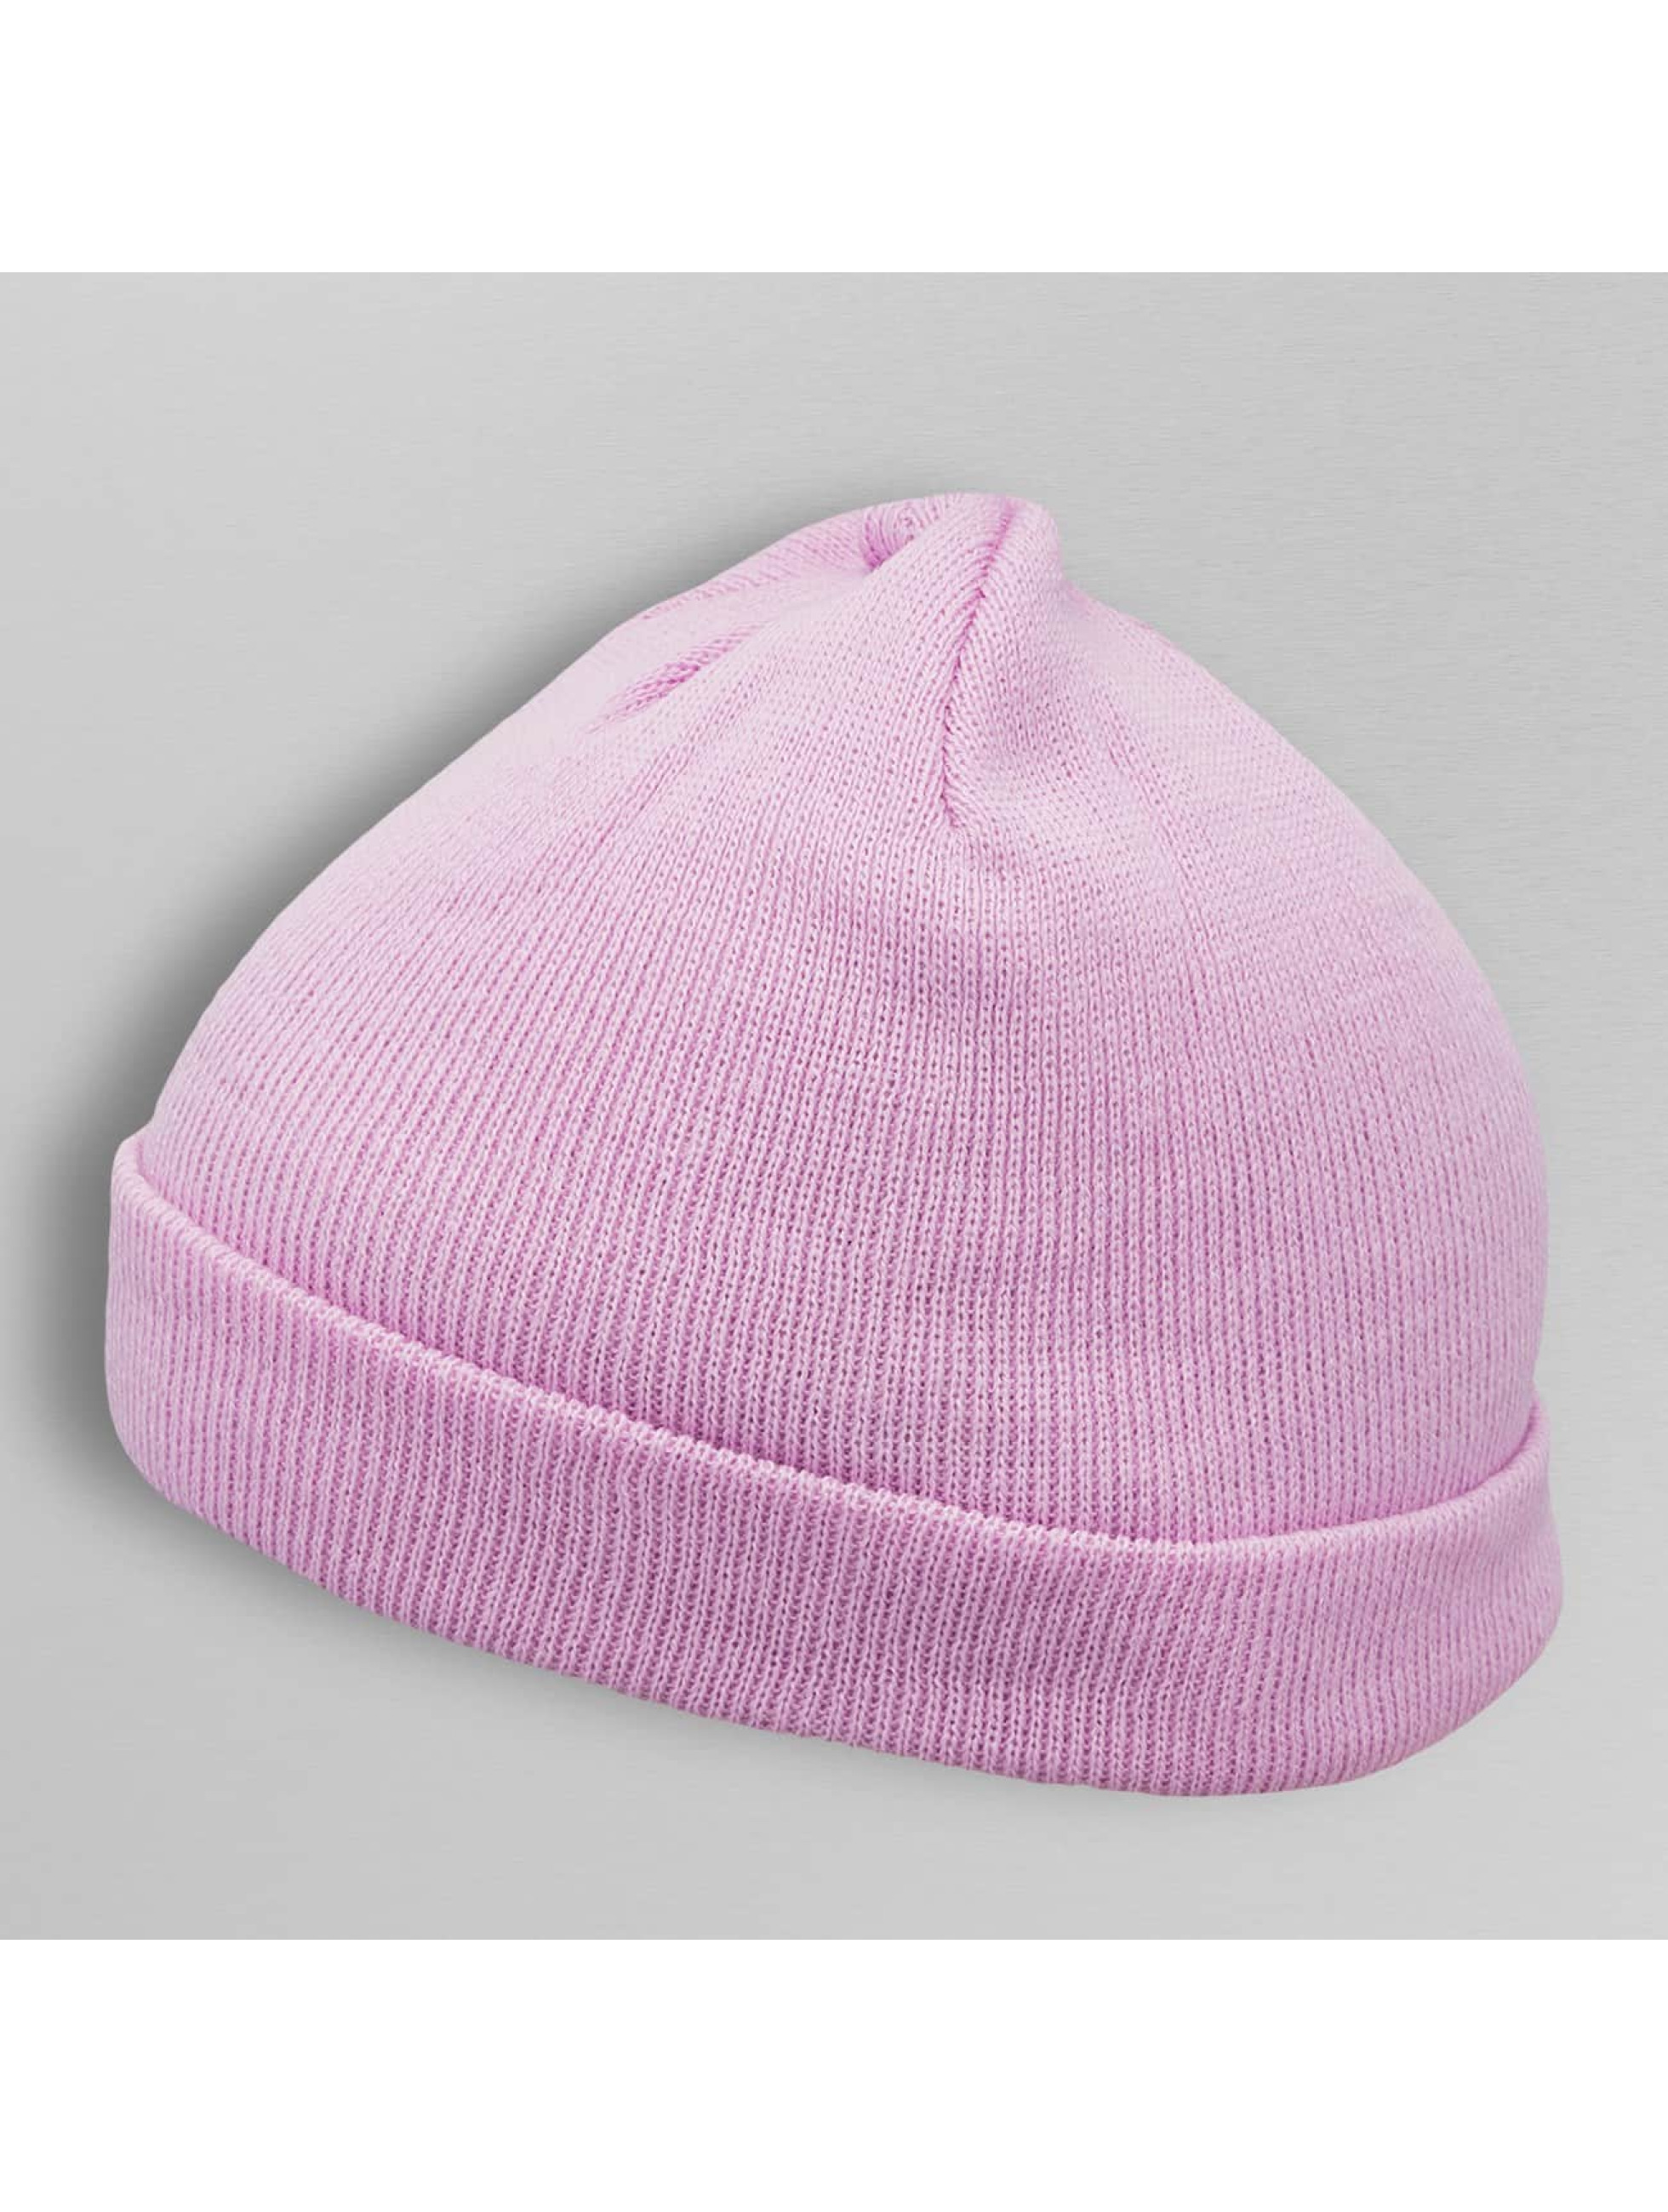 MSTRDS Beanie Short Pastel Cuff Knit violet